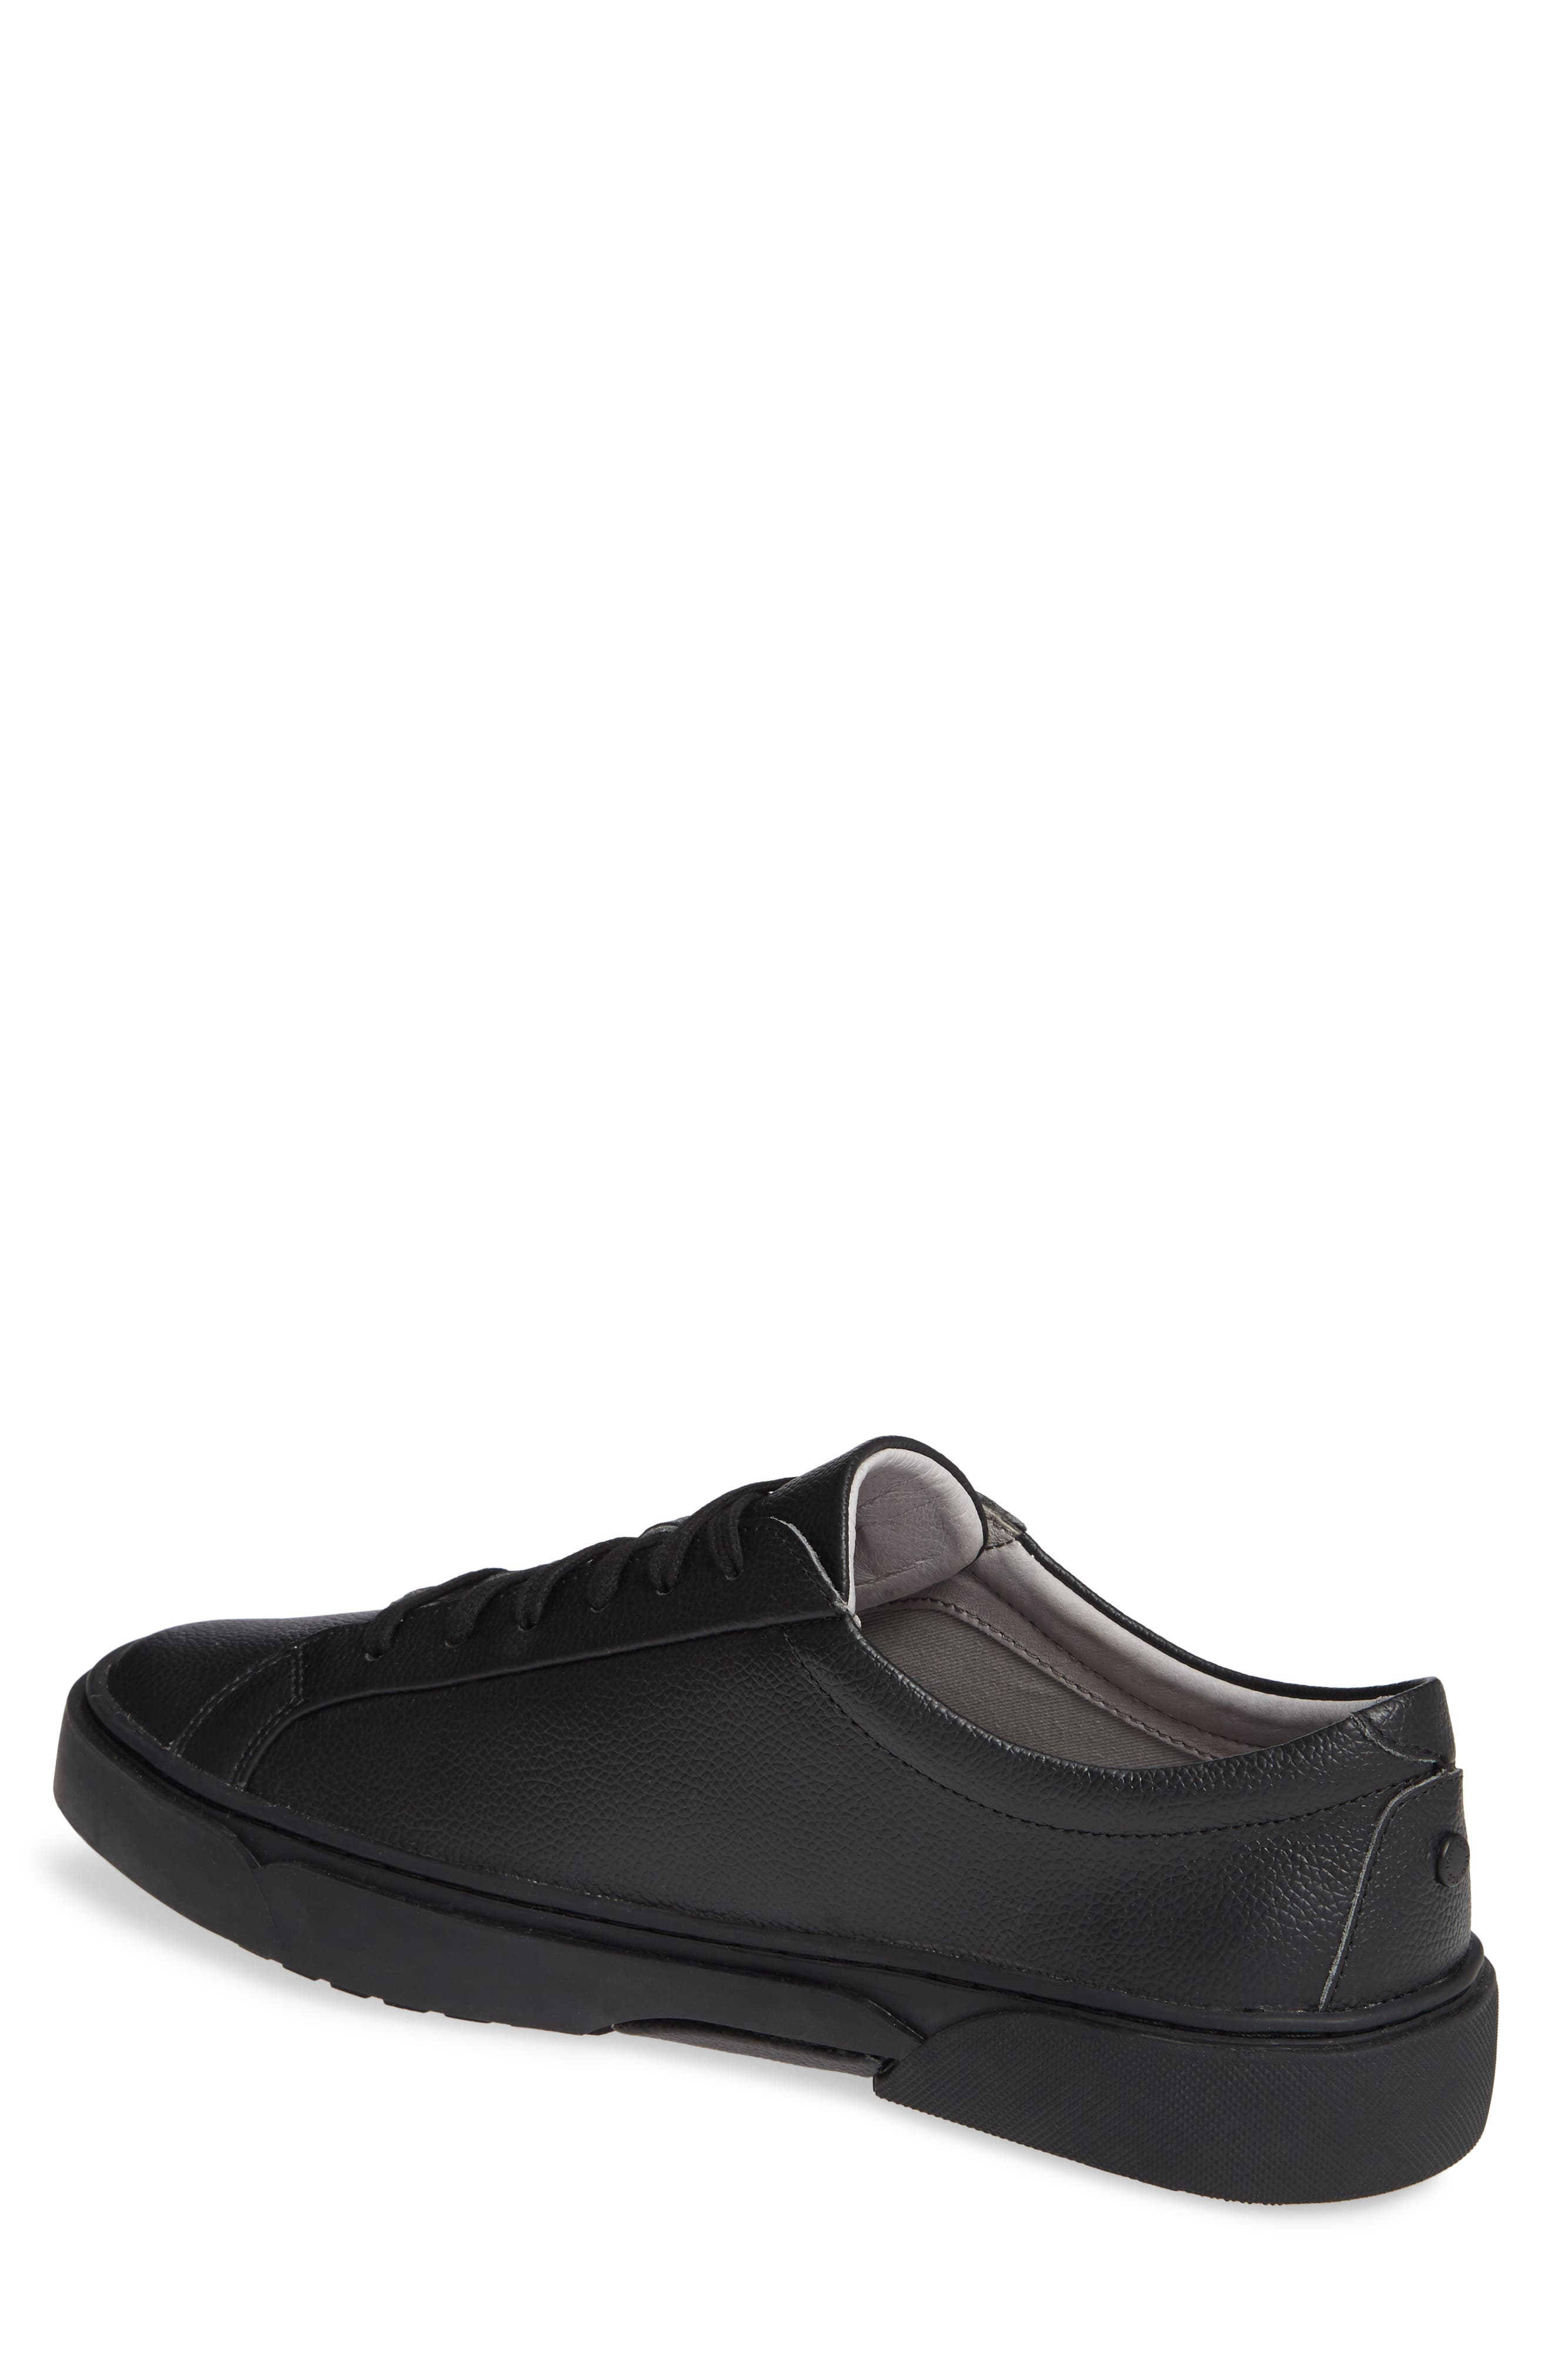 Ken Sneaker,                             Alternate thumbnail 2, color,                             TRIPLE BLACK LEATHER